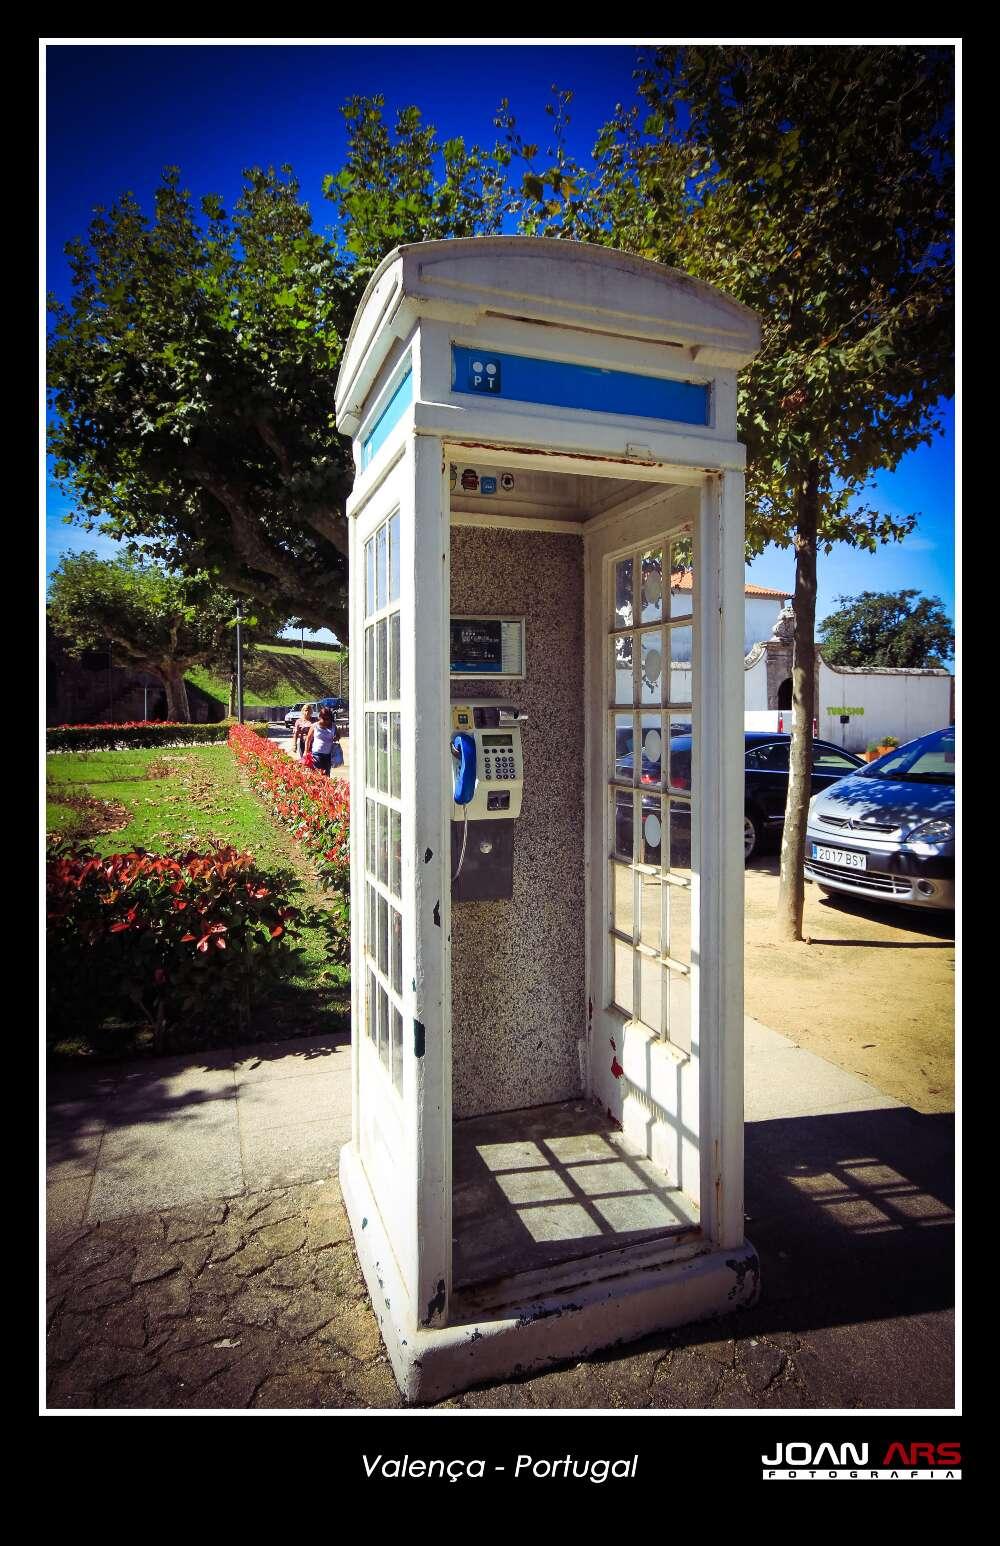 Galicia-2014-592.jpg